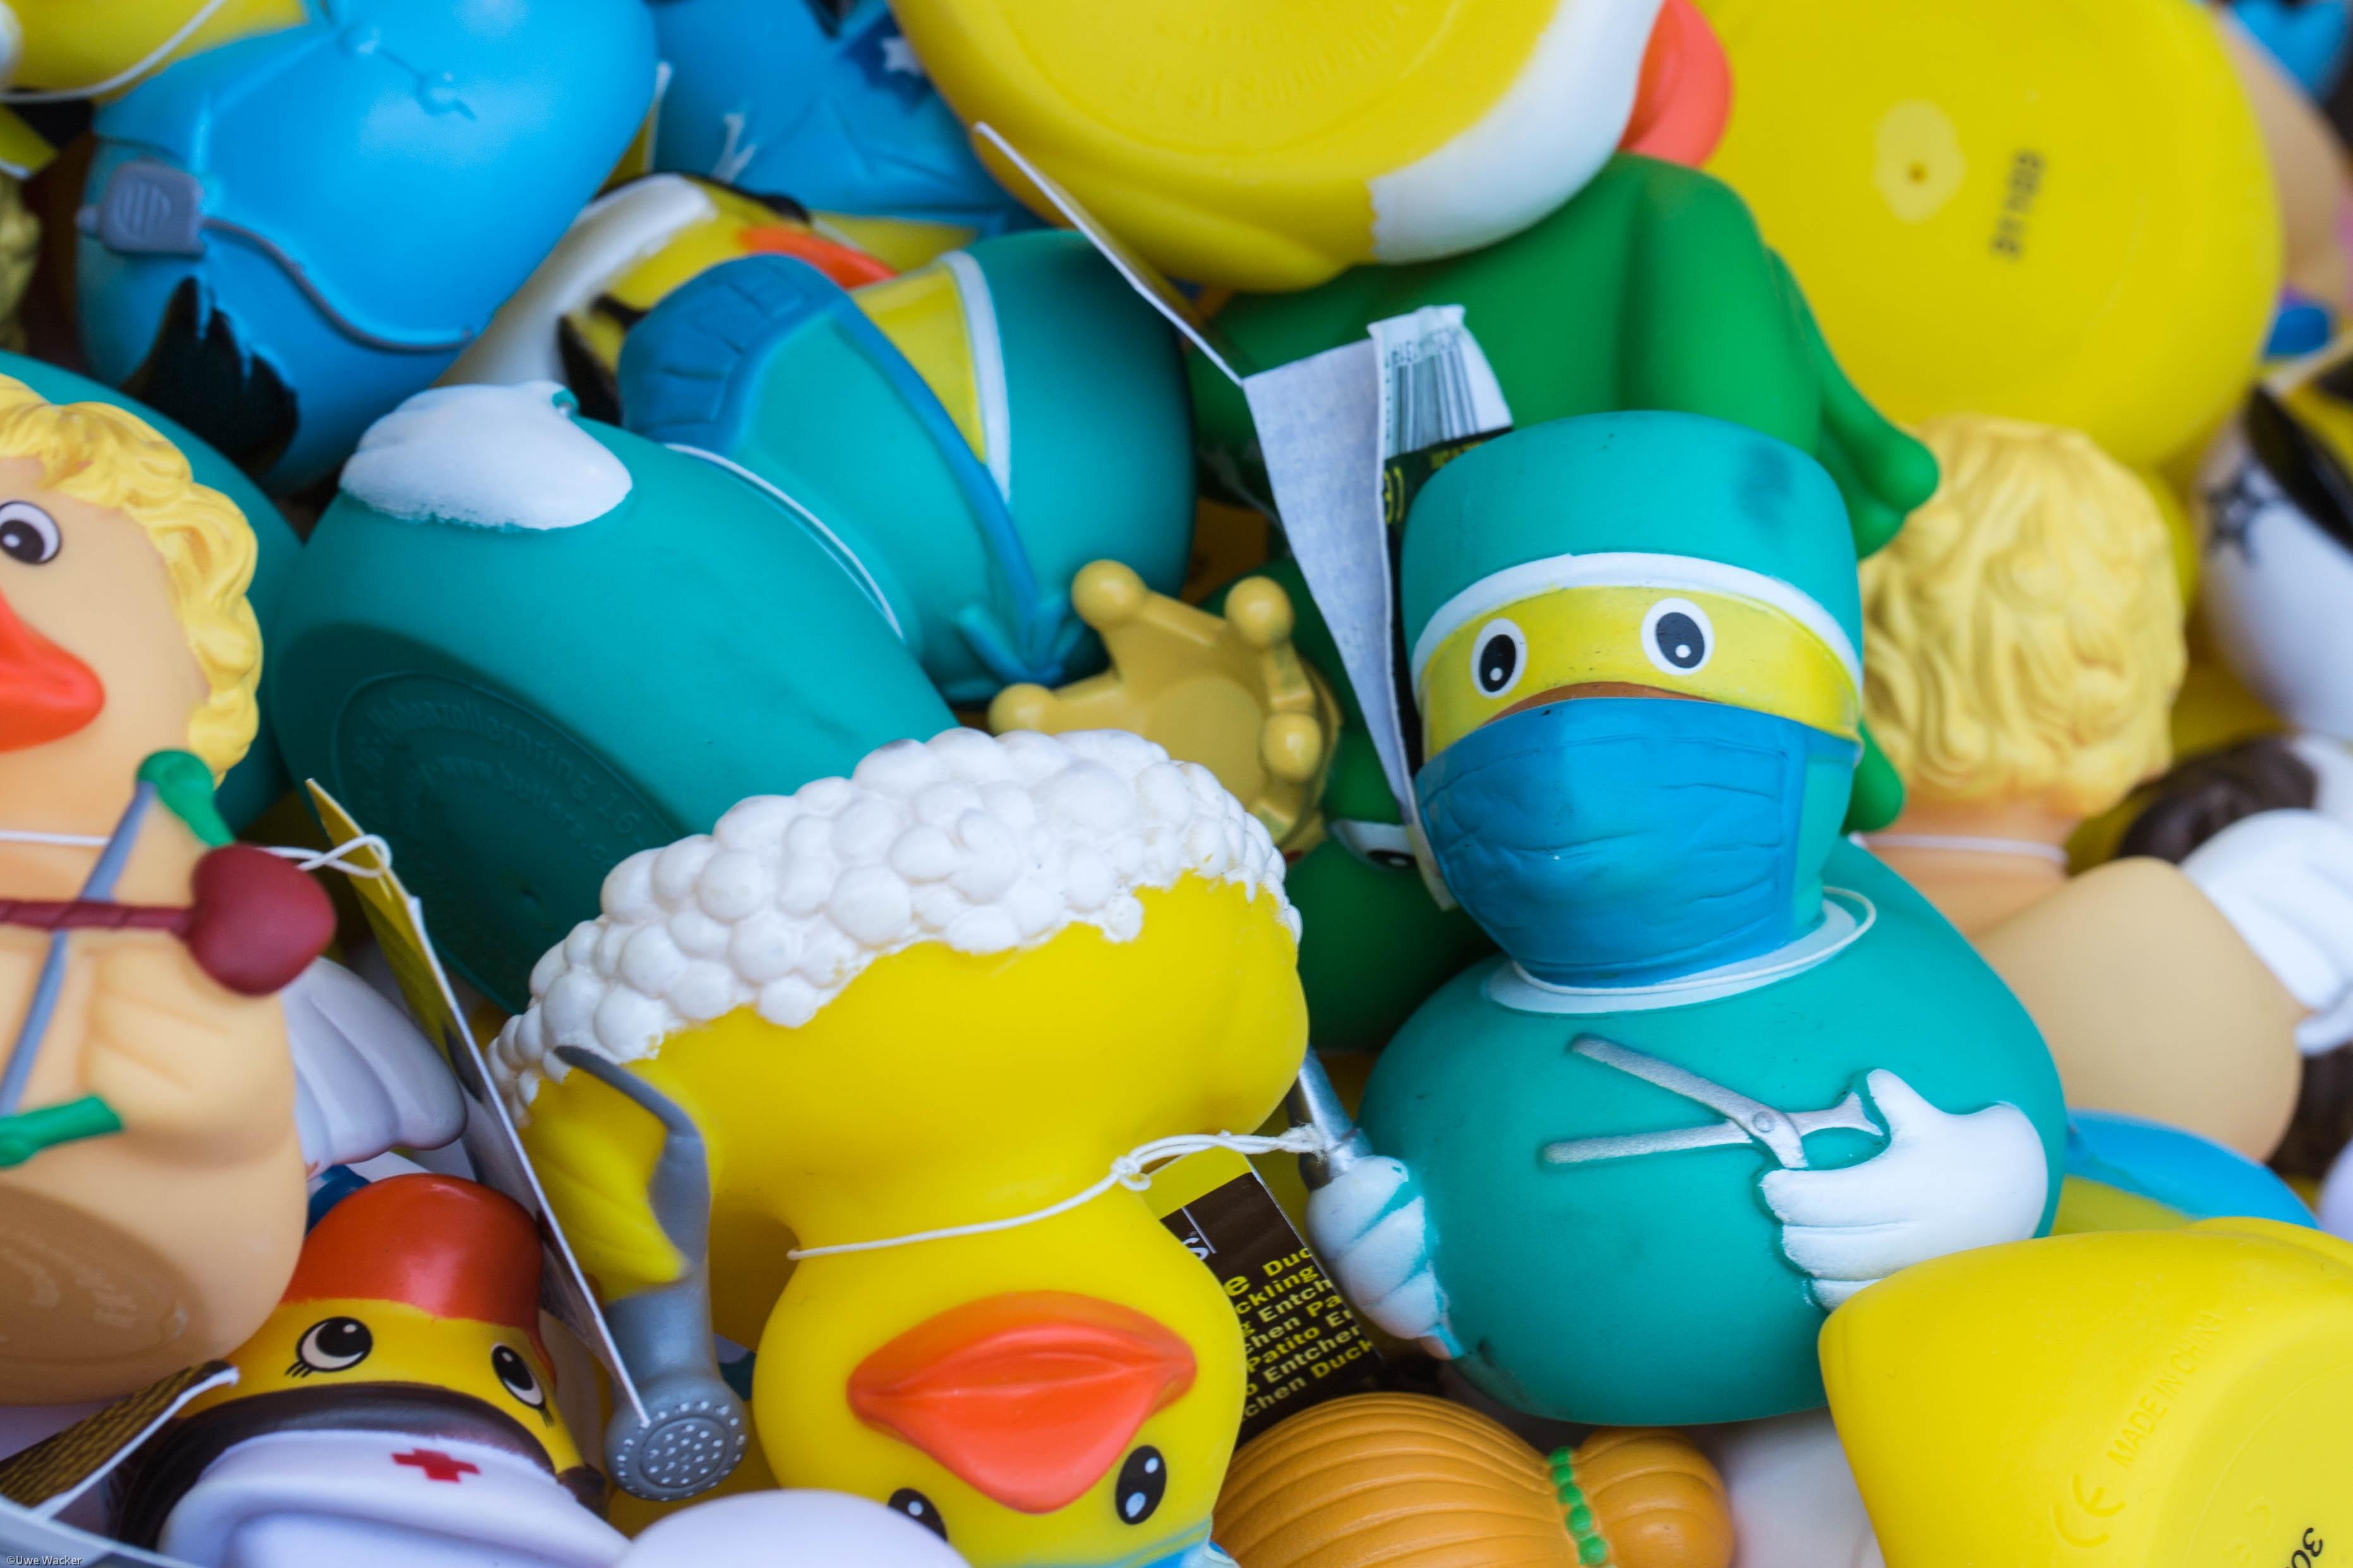 Gambar Bermain Balon Makanan Warna Kuning Mainan Bebek Karet Anak Ahli Bedah Boneka